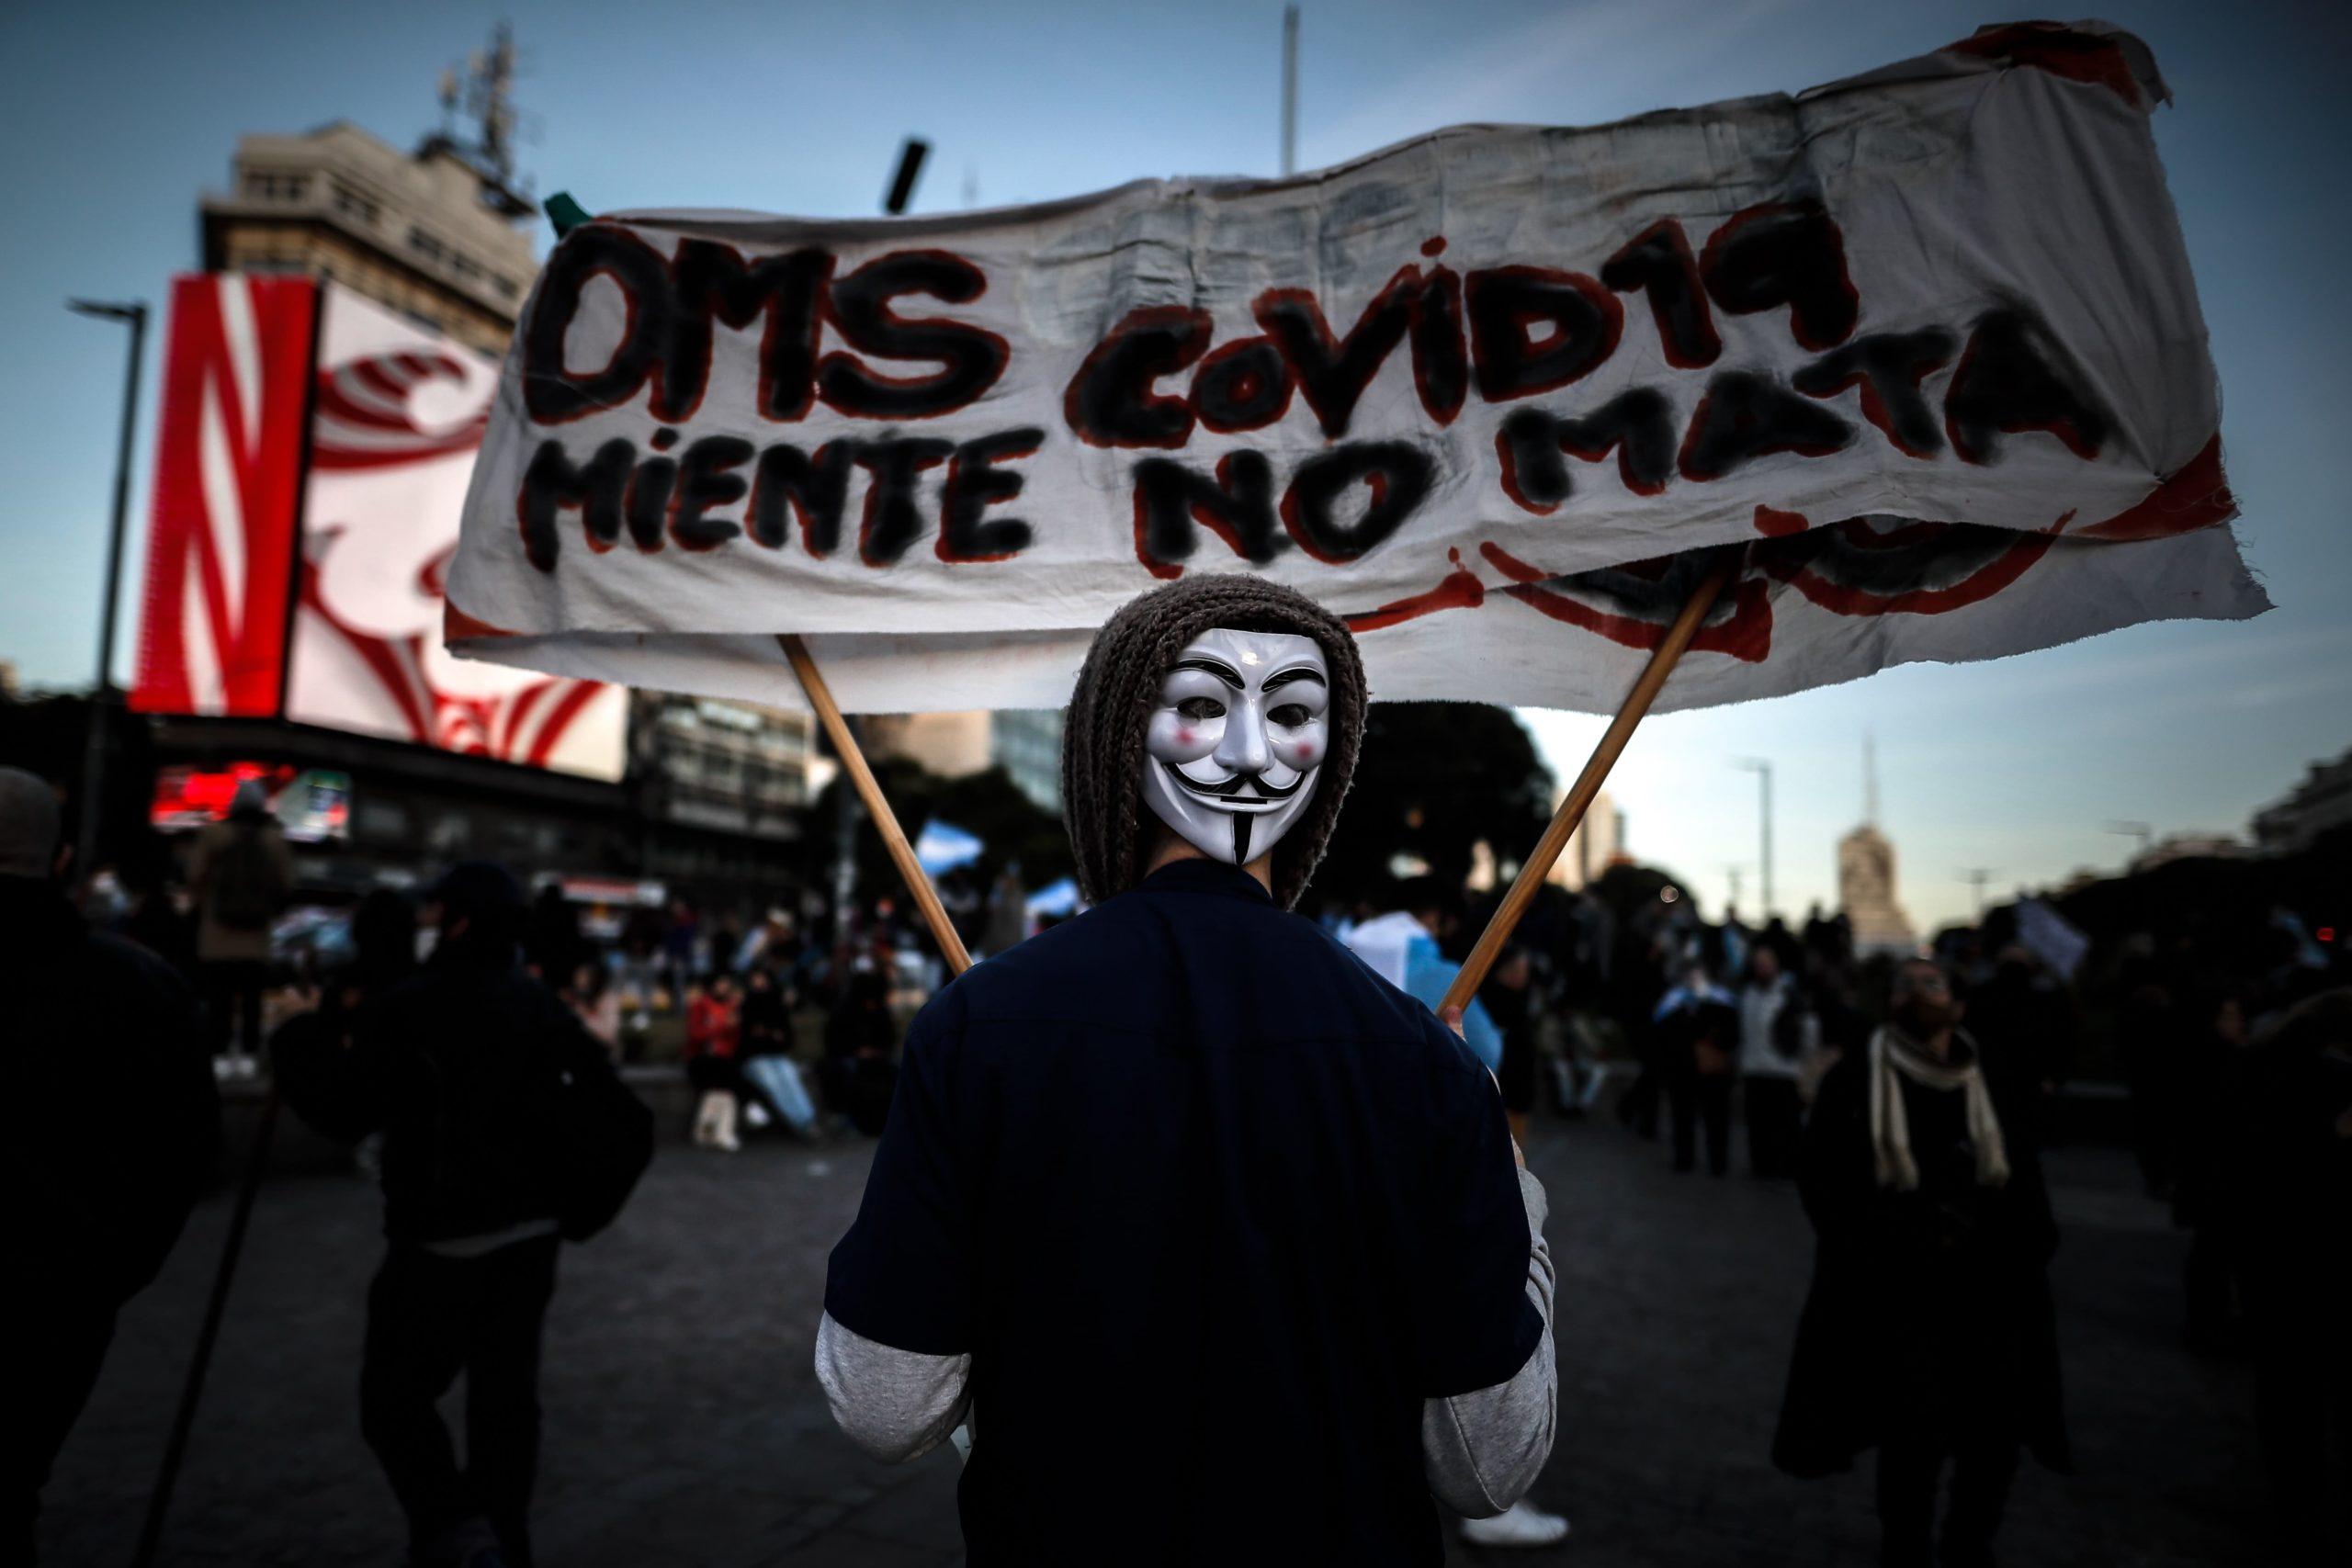 grupos-politicos-religiosos-detras-protestas-anti-cuarentena-argentina